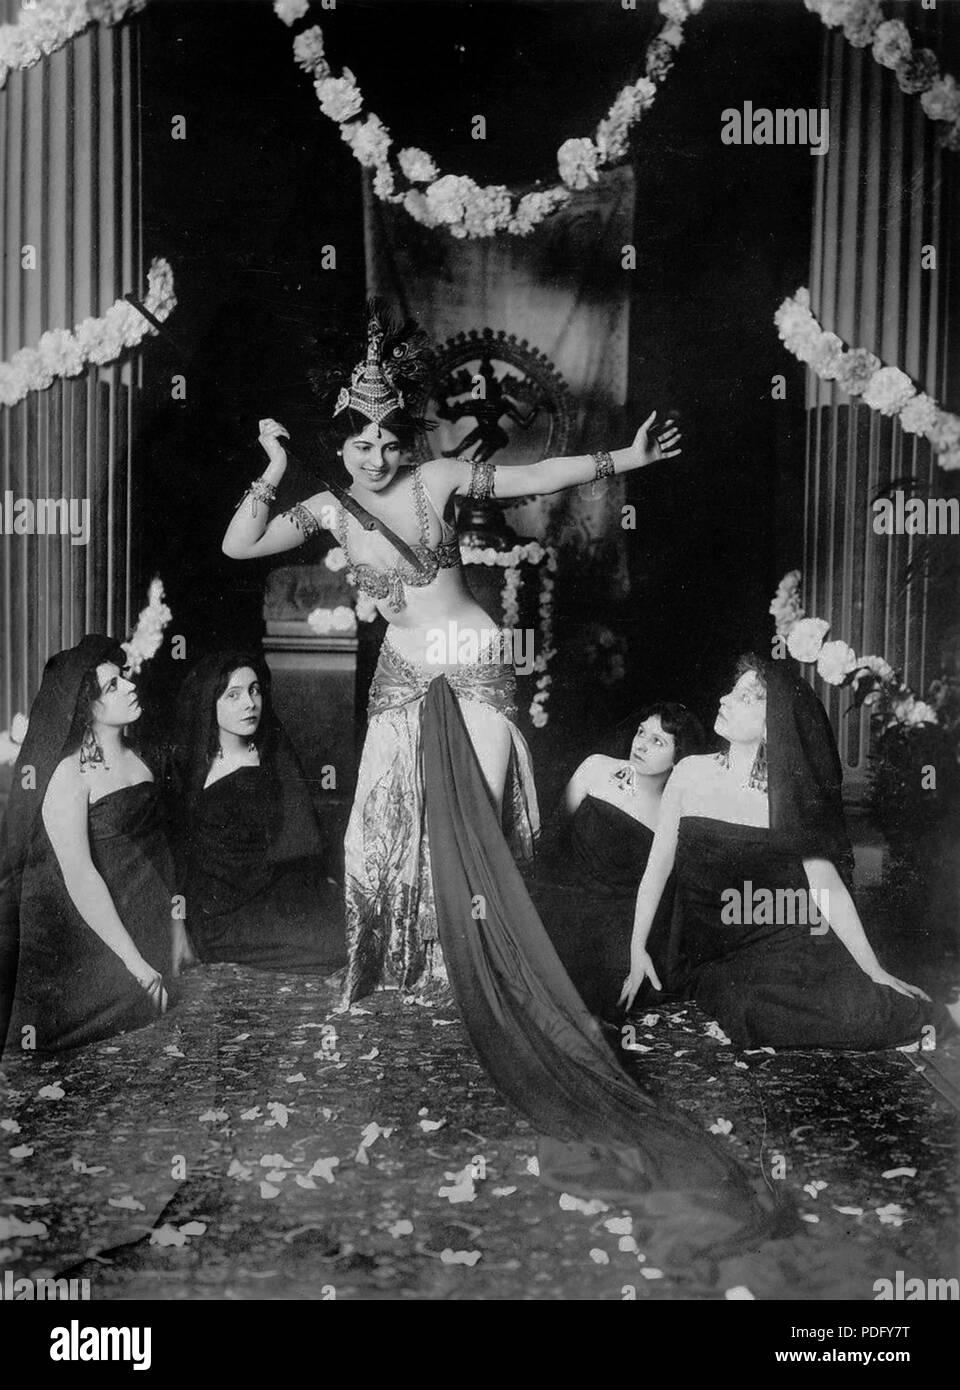 Madame Mac Méod (future Mata Hari) éxécutant des danses brahmaniques dans la bibliothèque du Musée Guimet de Paris *13-3-1905 221 Mata Hari dancing in the Musée Guimet (1905) - 1 Stock Photo